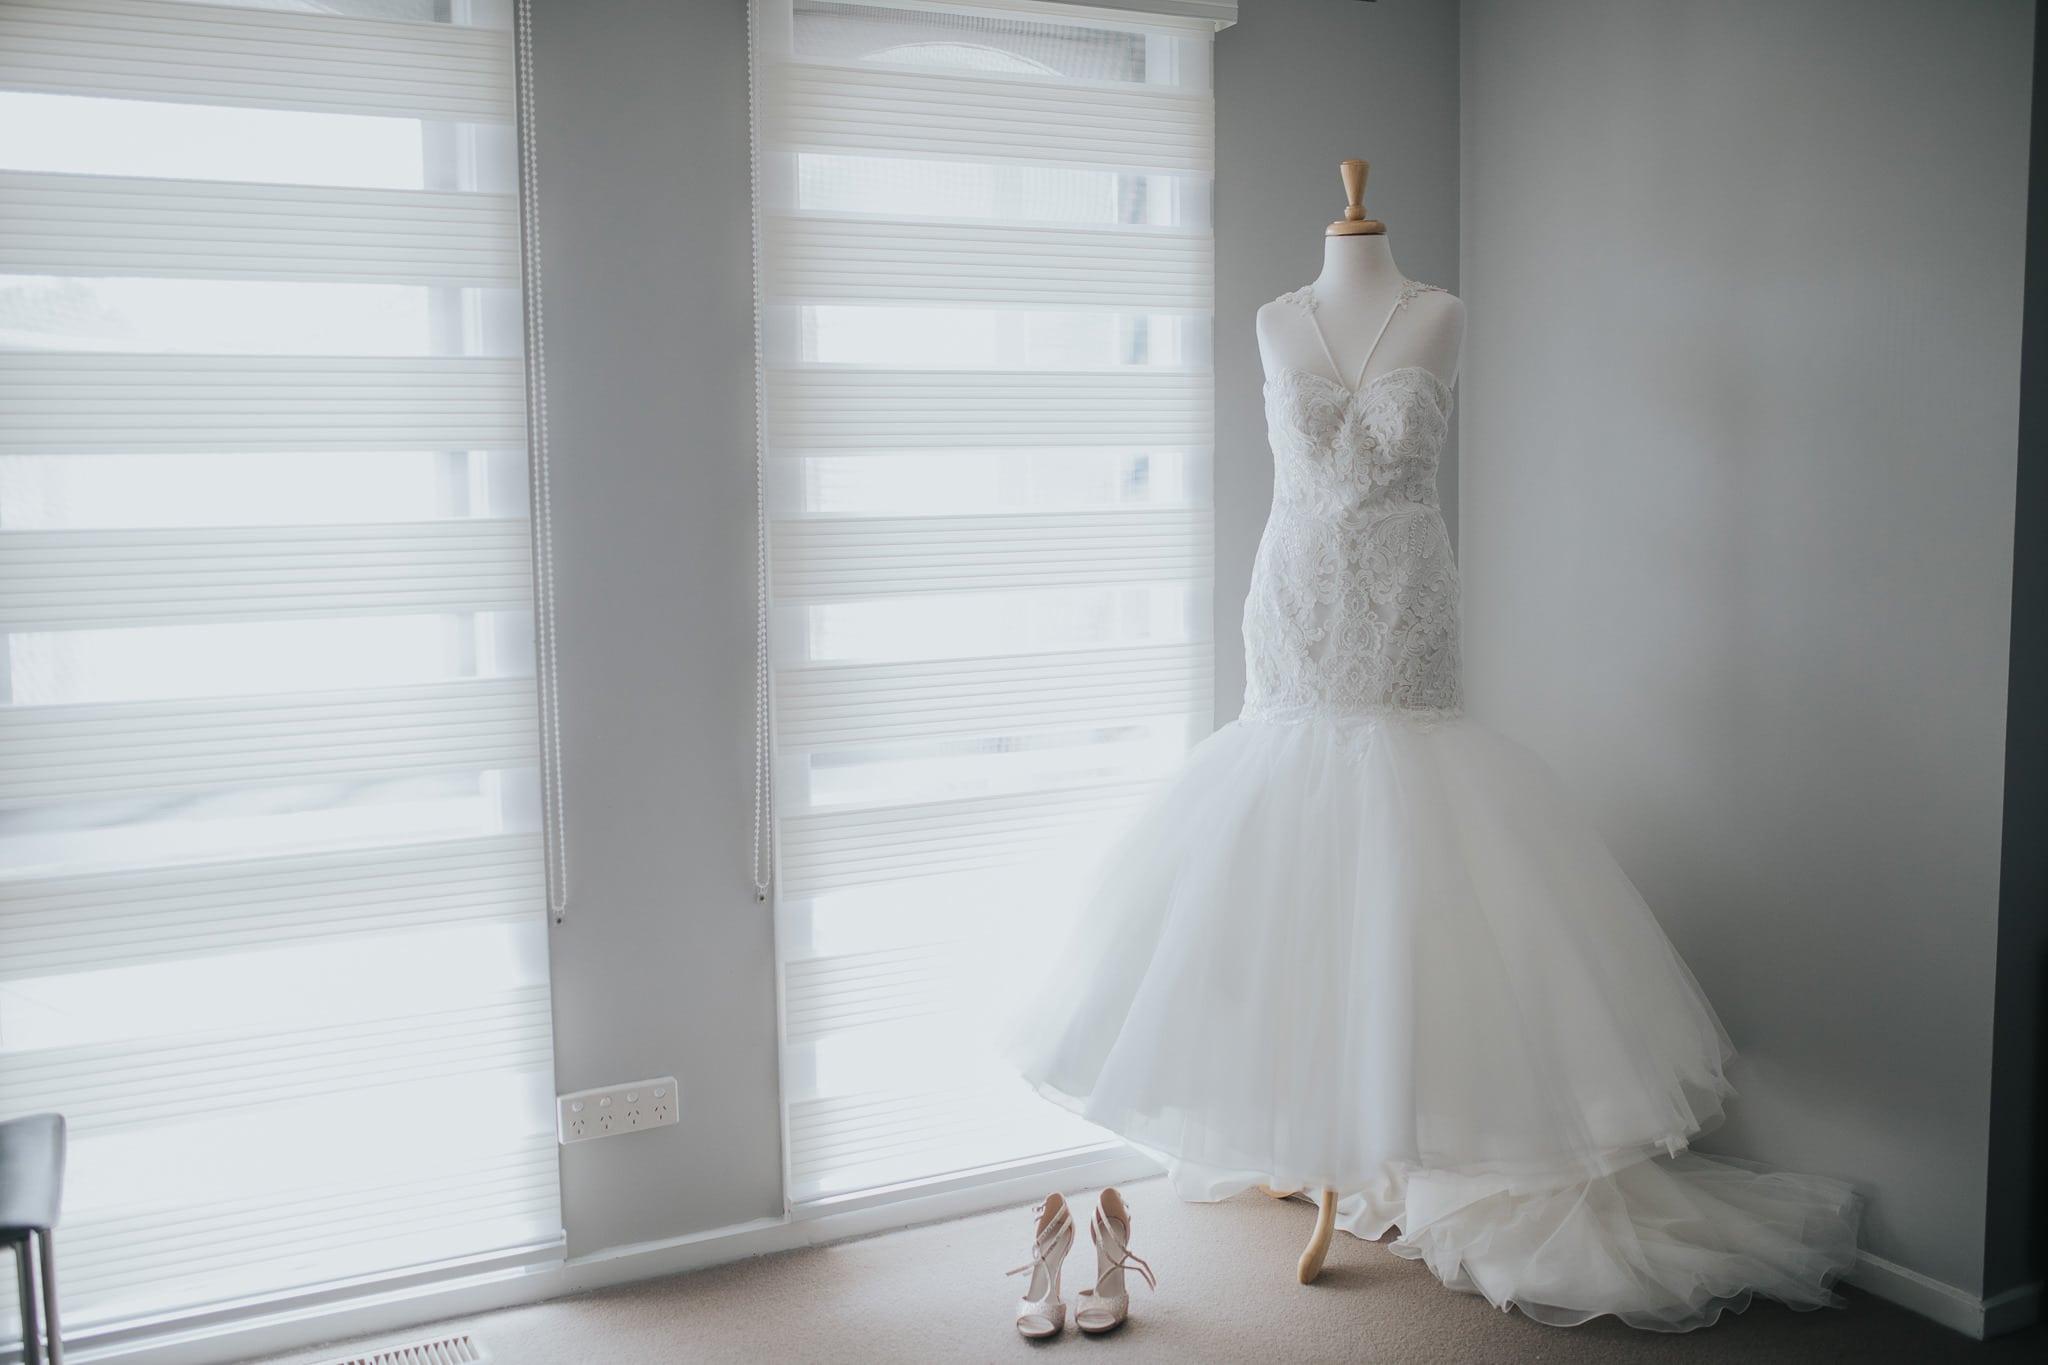 The Wedding Dress - Luxury weddings in Melbourne